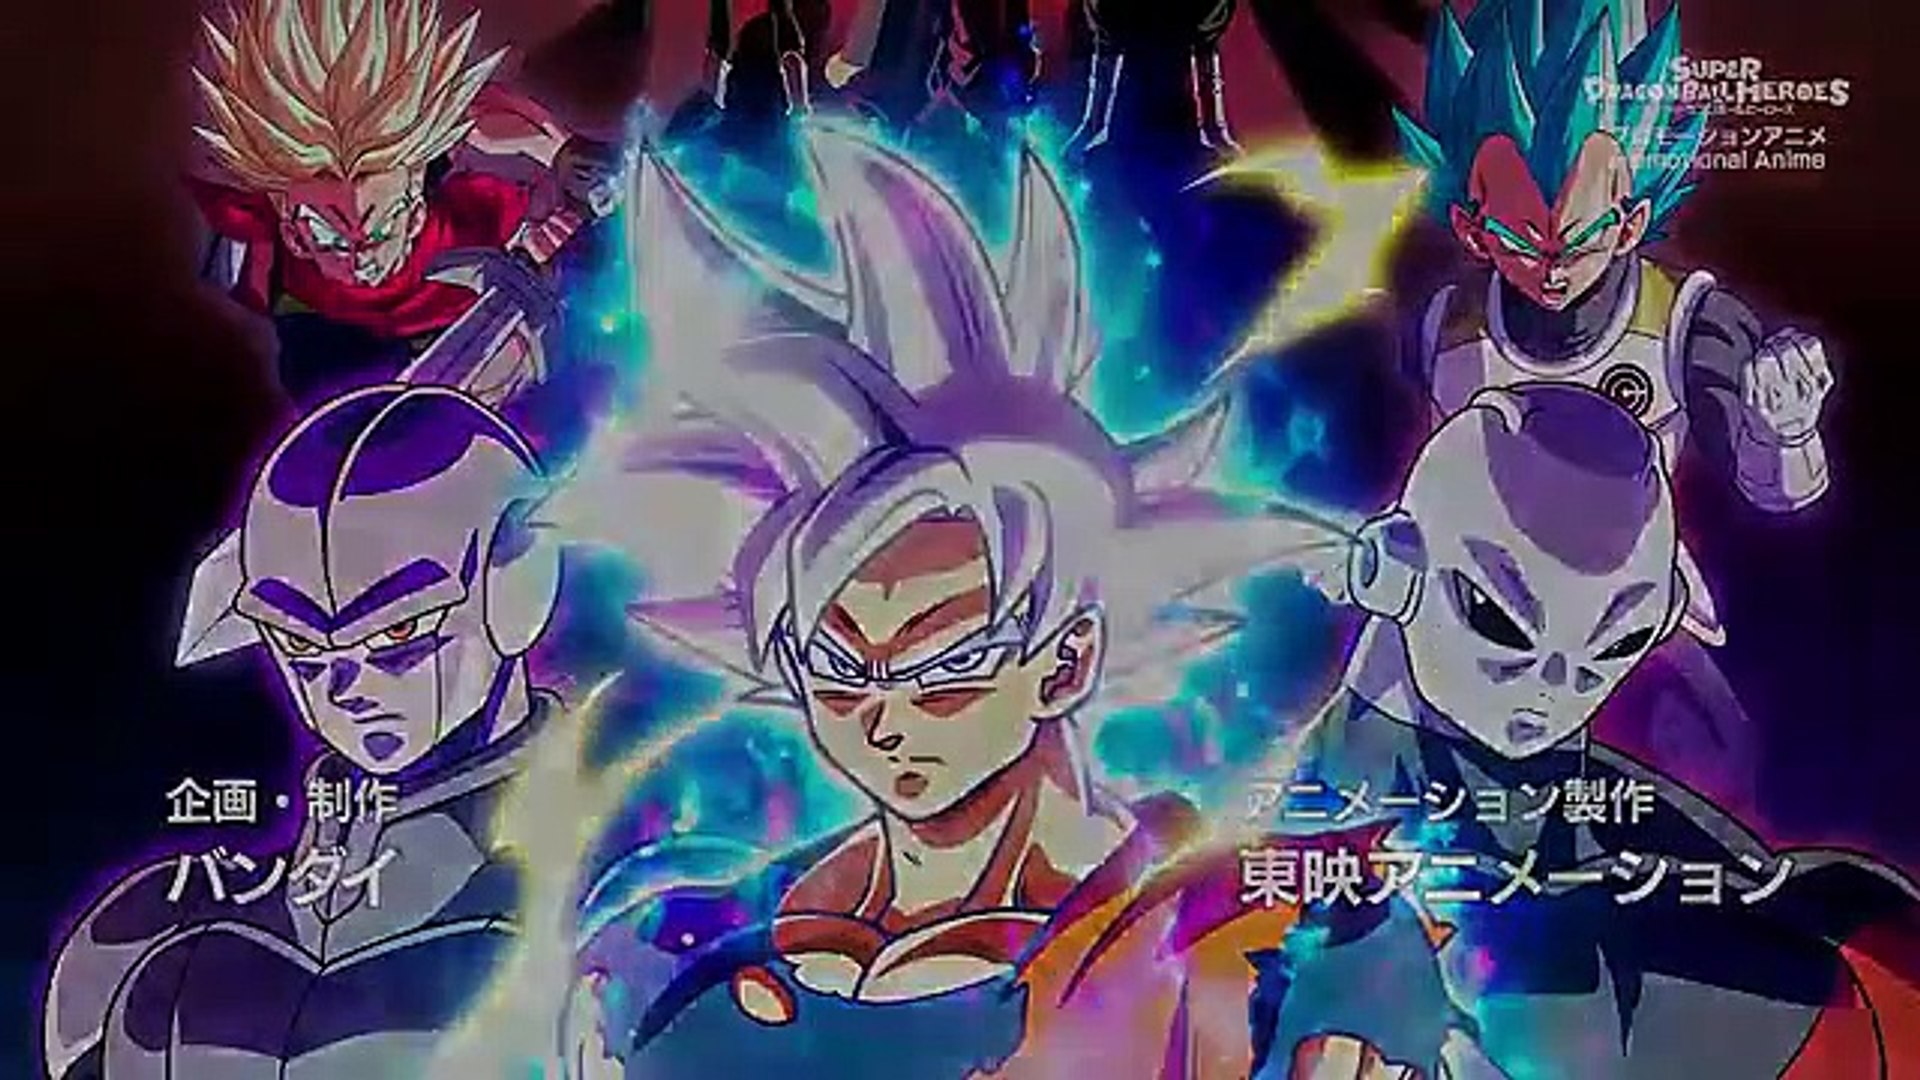 Super Dragon Ball Heroes Episode 12